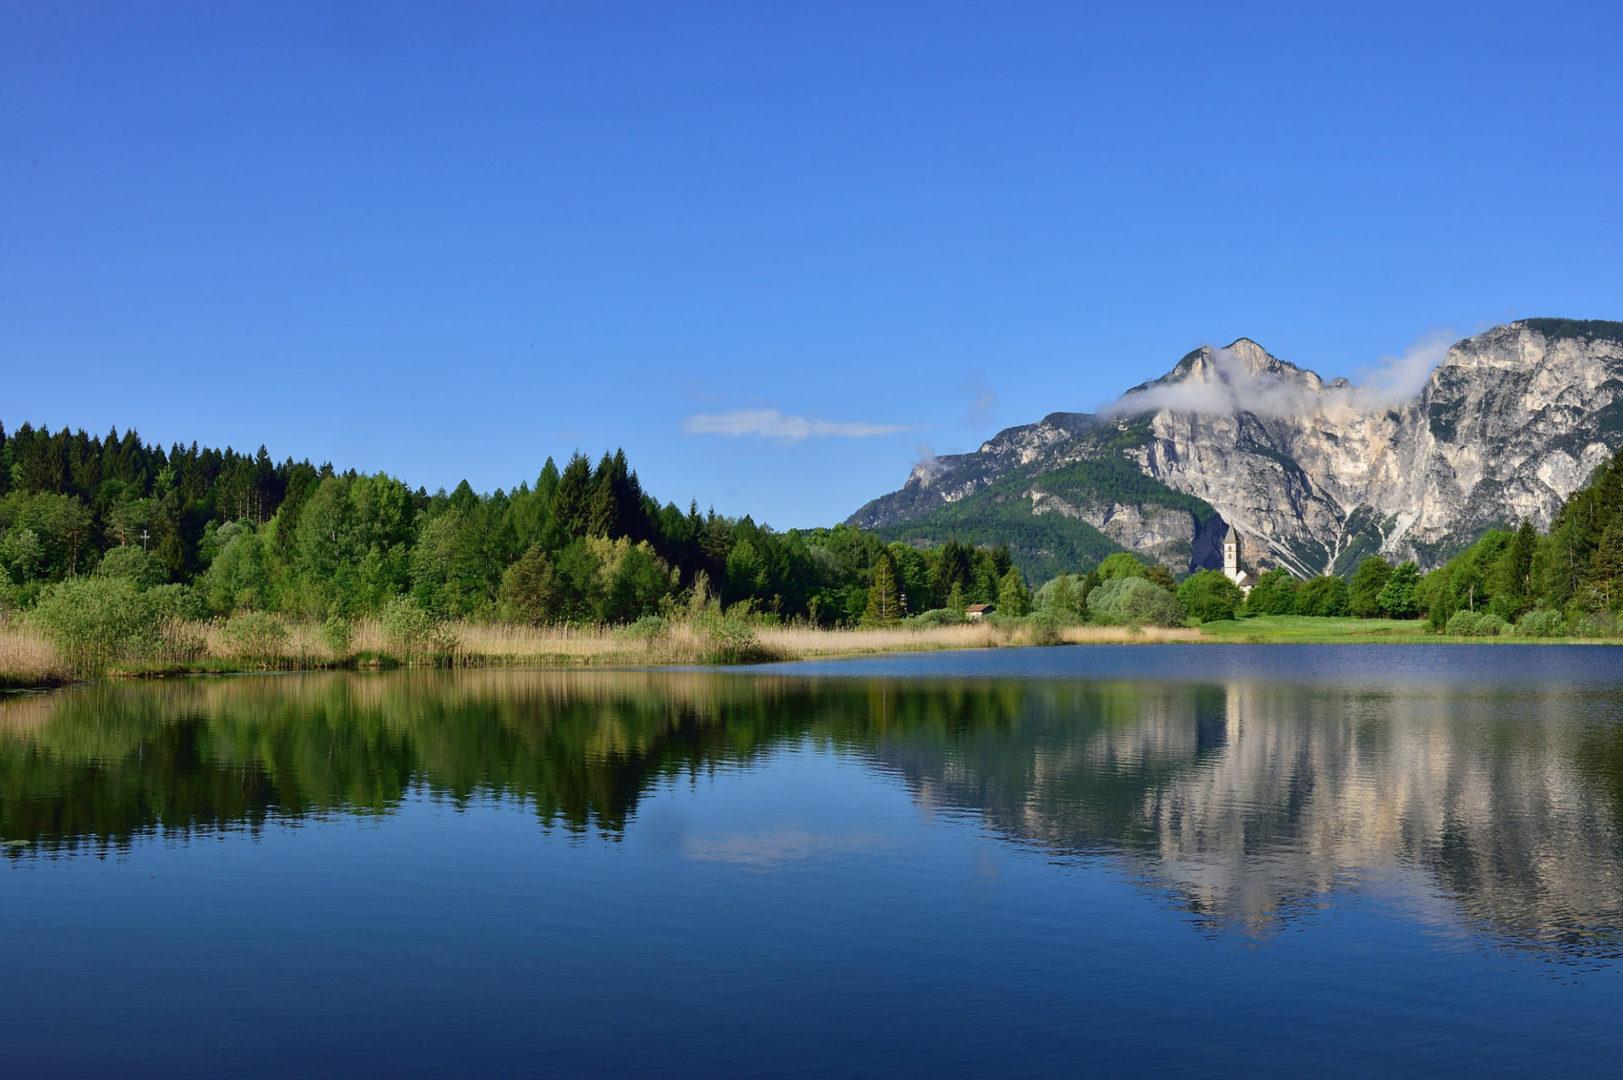 Nuotare in Alto Adige